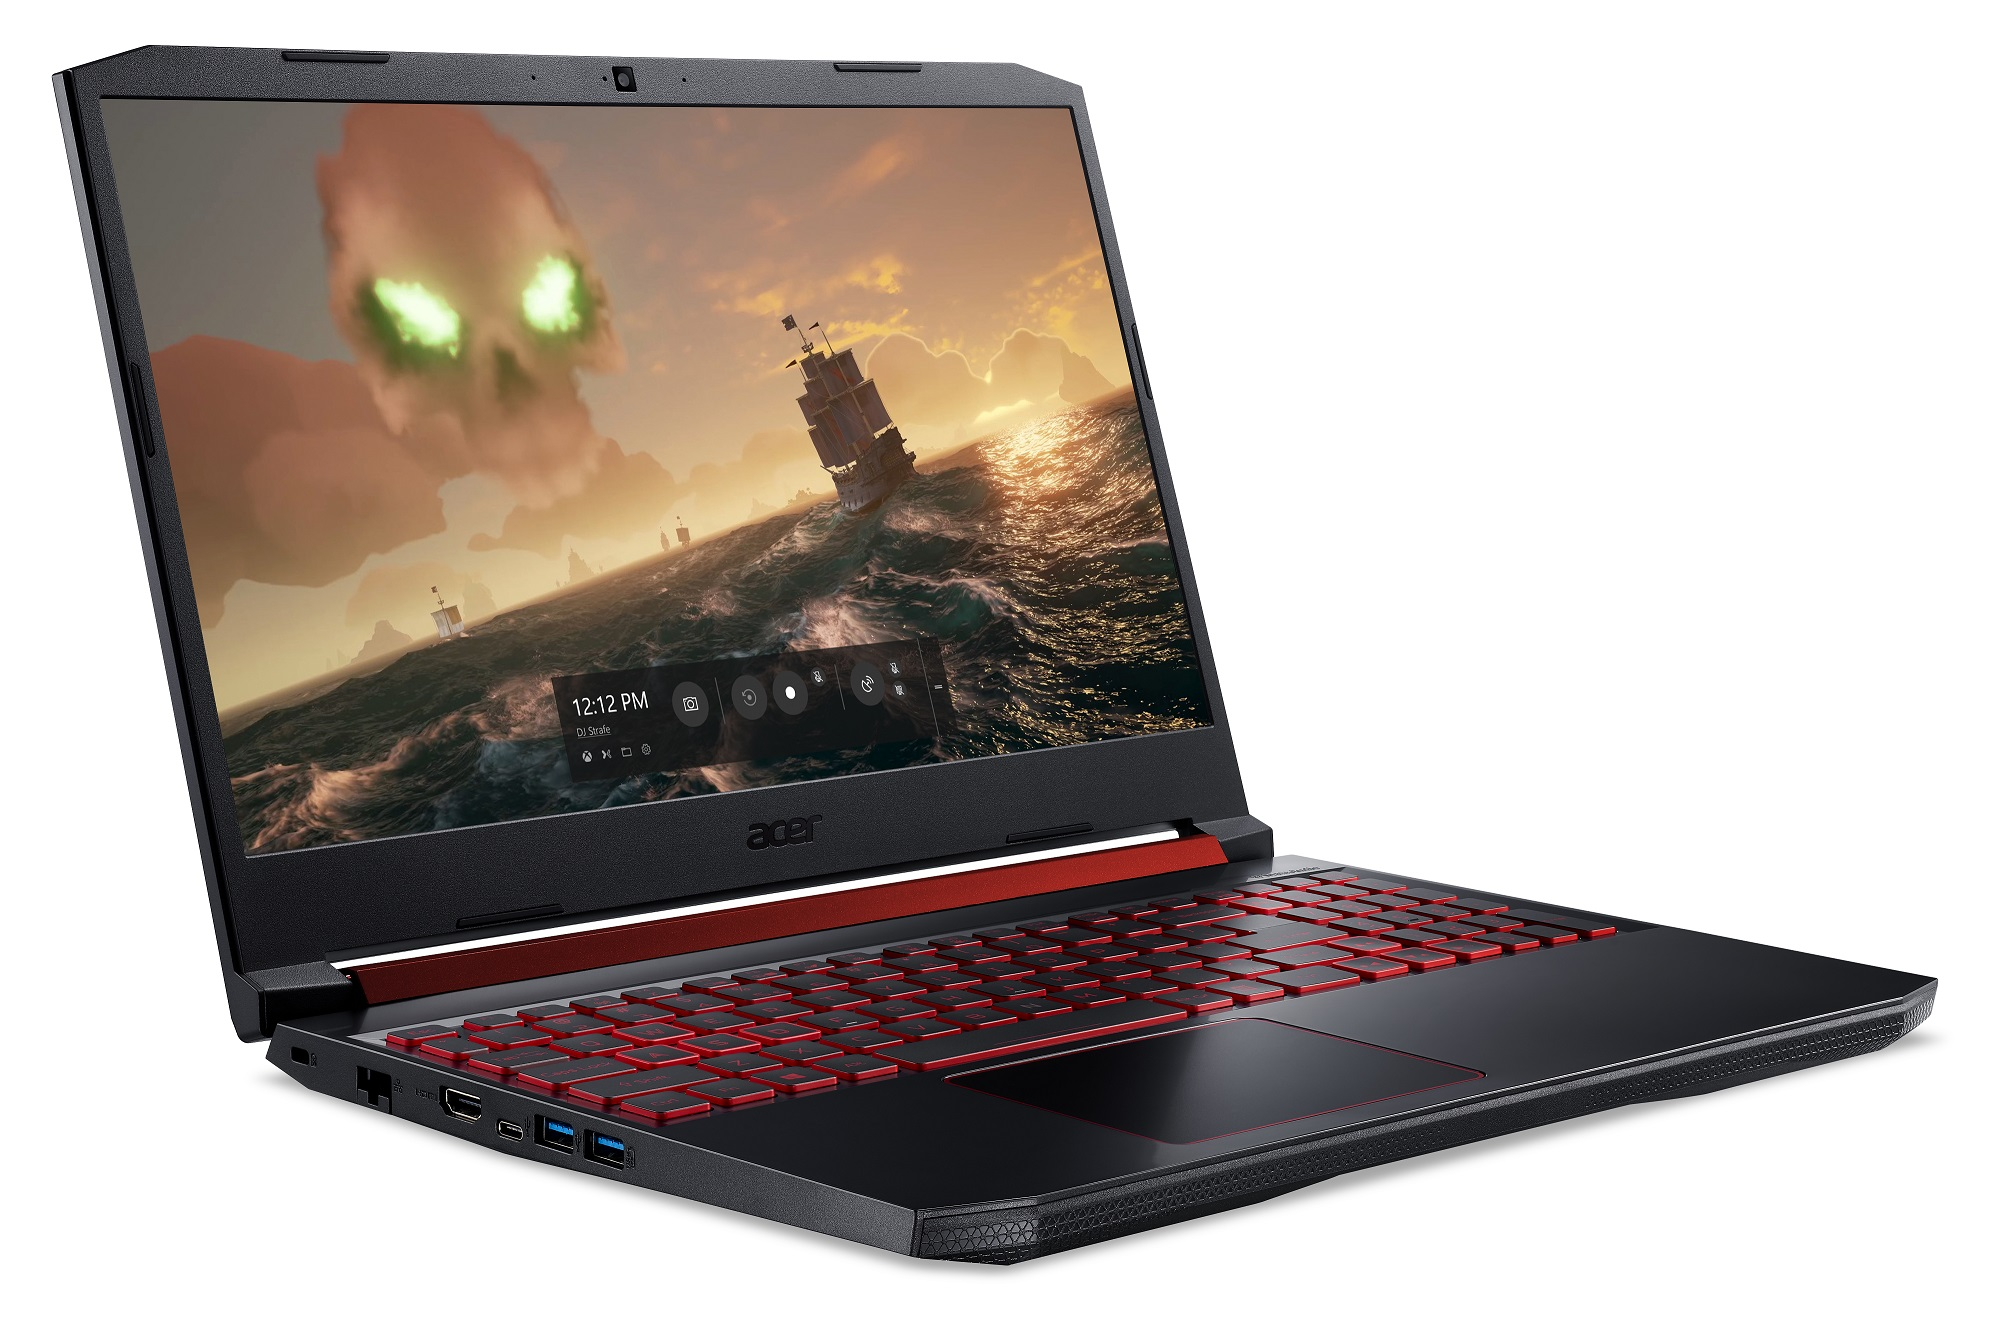 Acer Nitro 5 Gaming Laptop, best black friday gaming laptop deals 2020